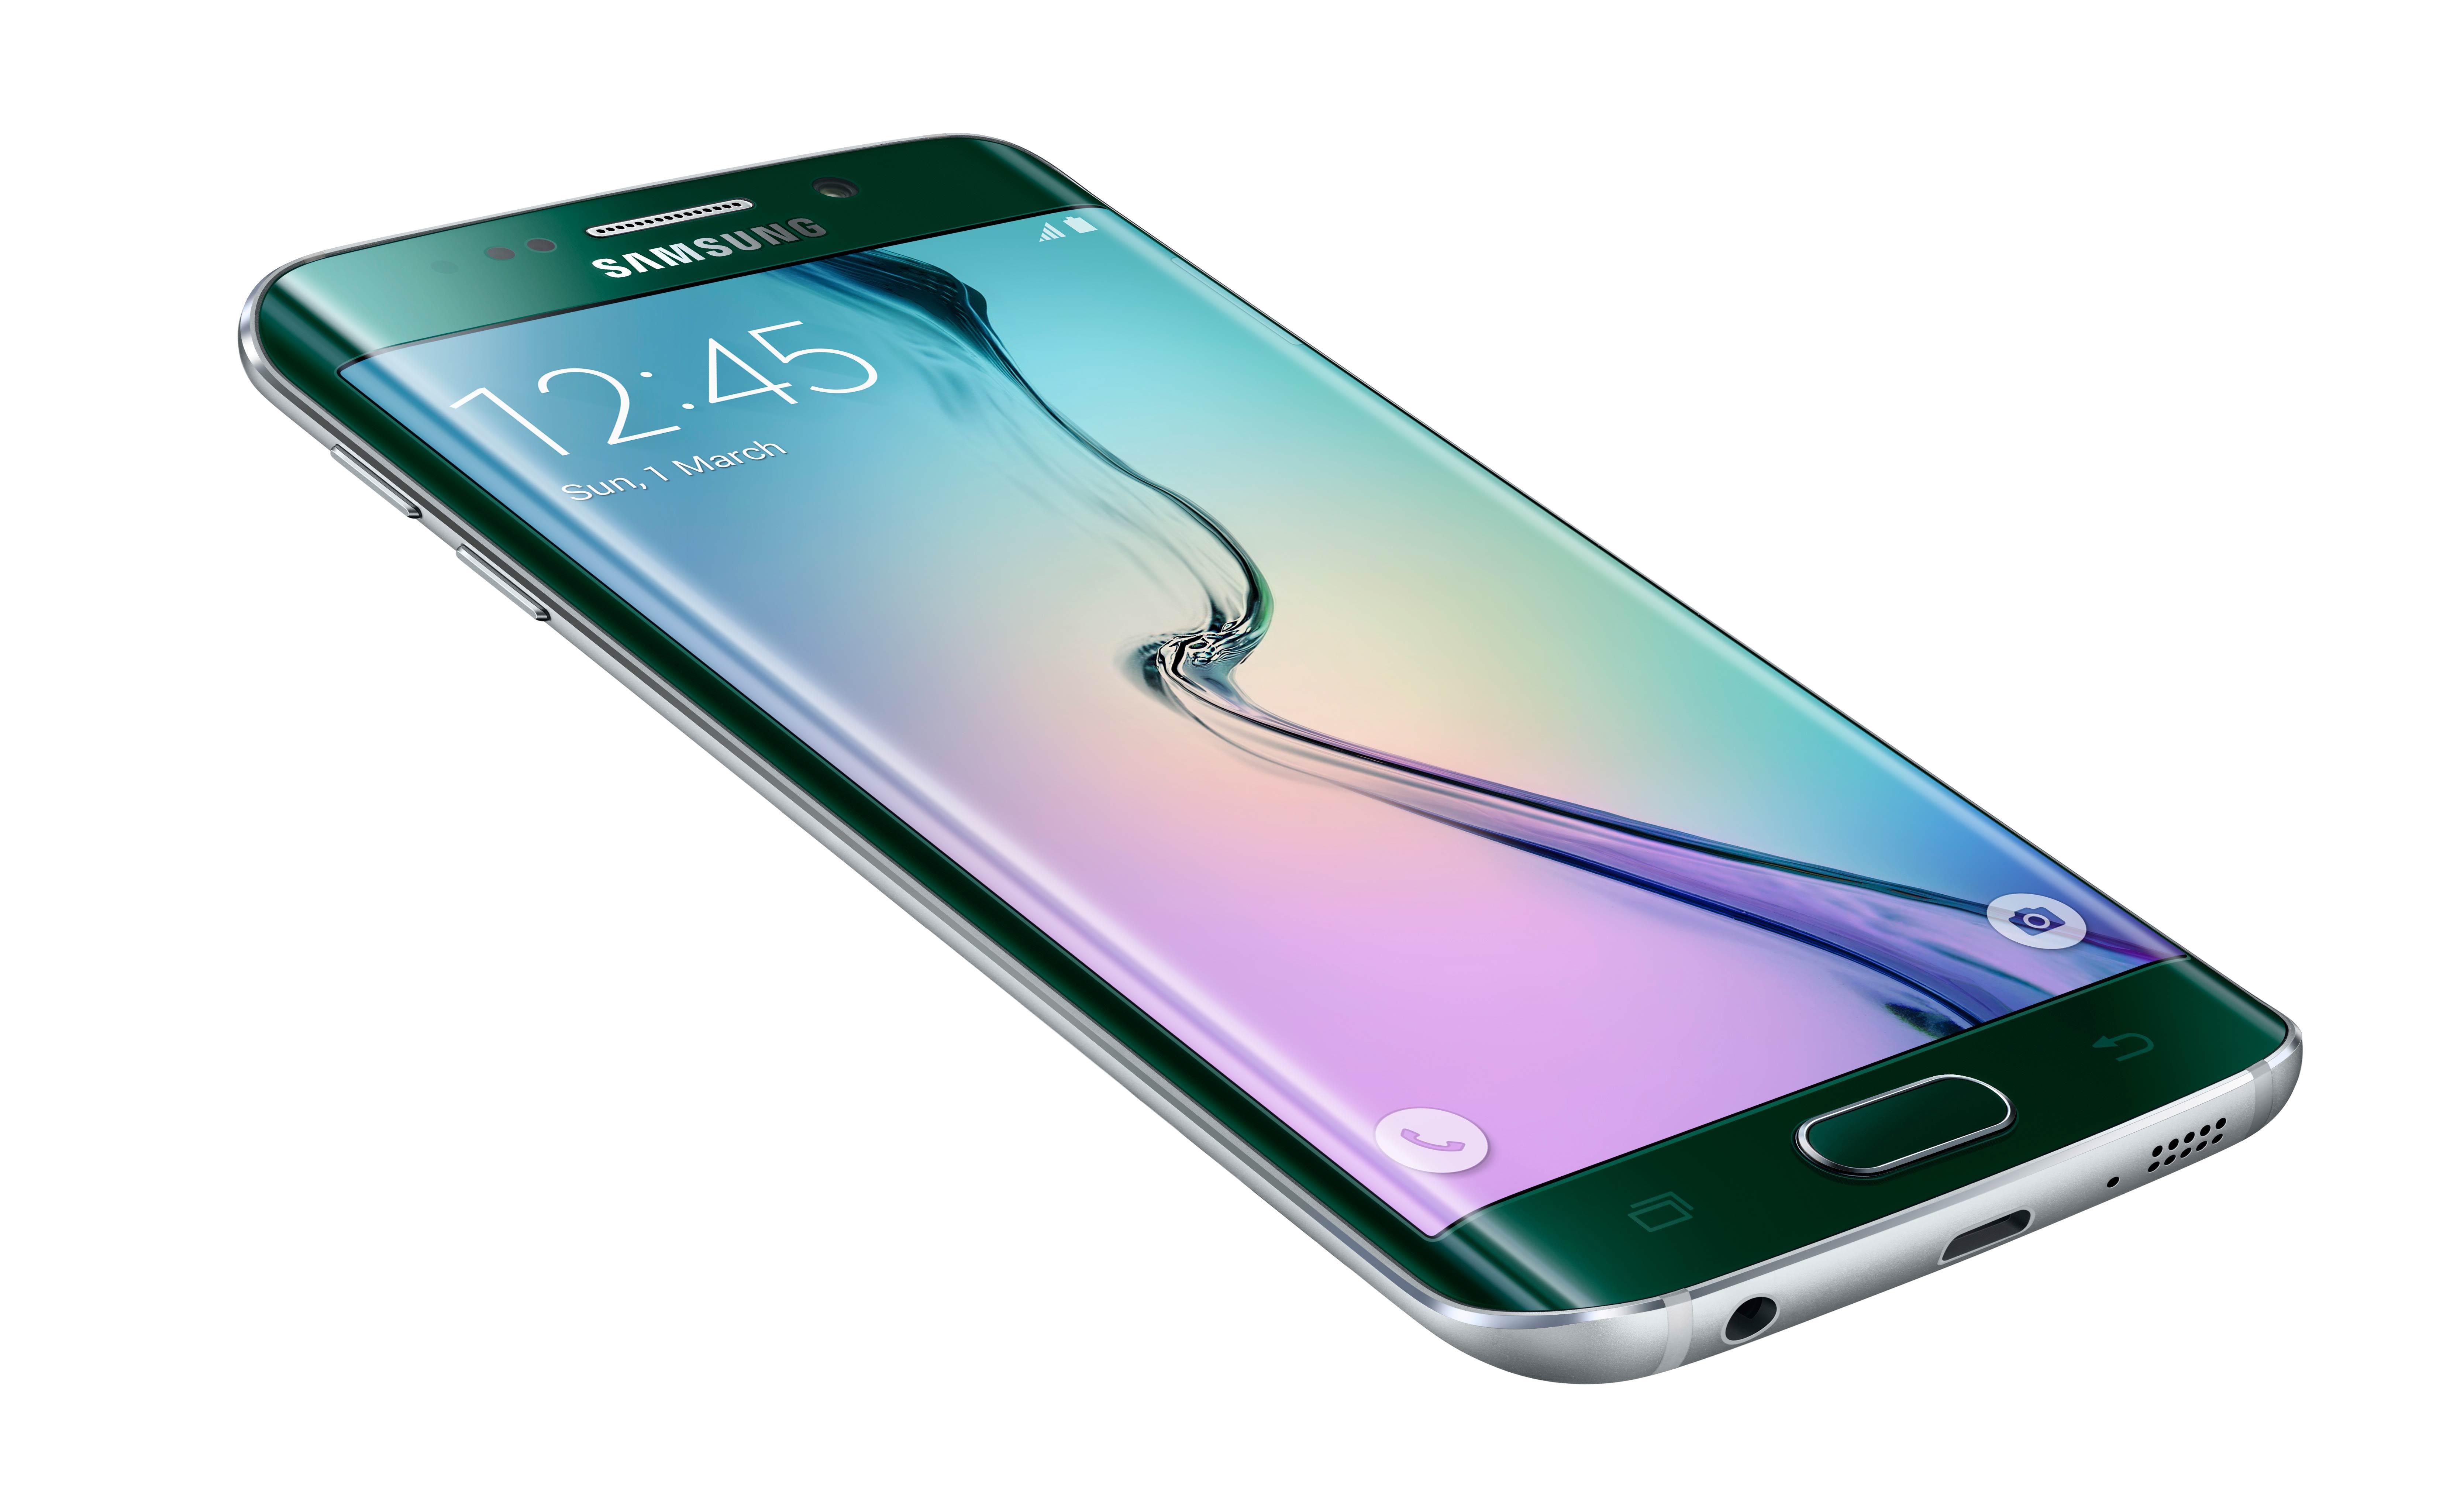 Galaxy S6 Edge: Adding Custom Ringtones - Fliptroniks.com